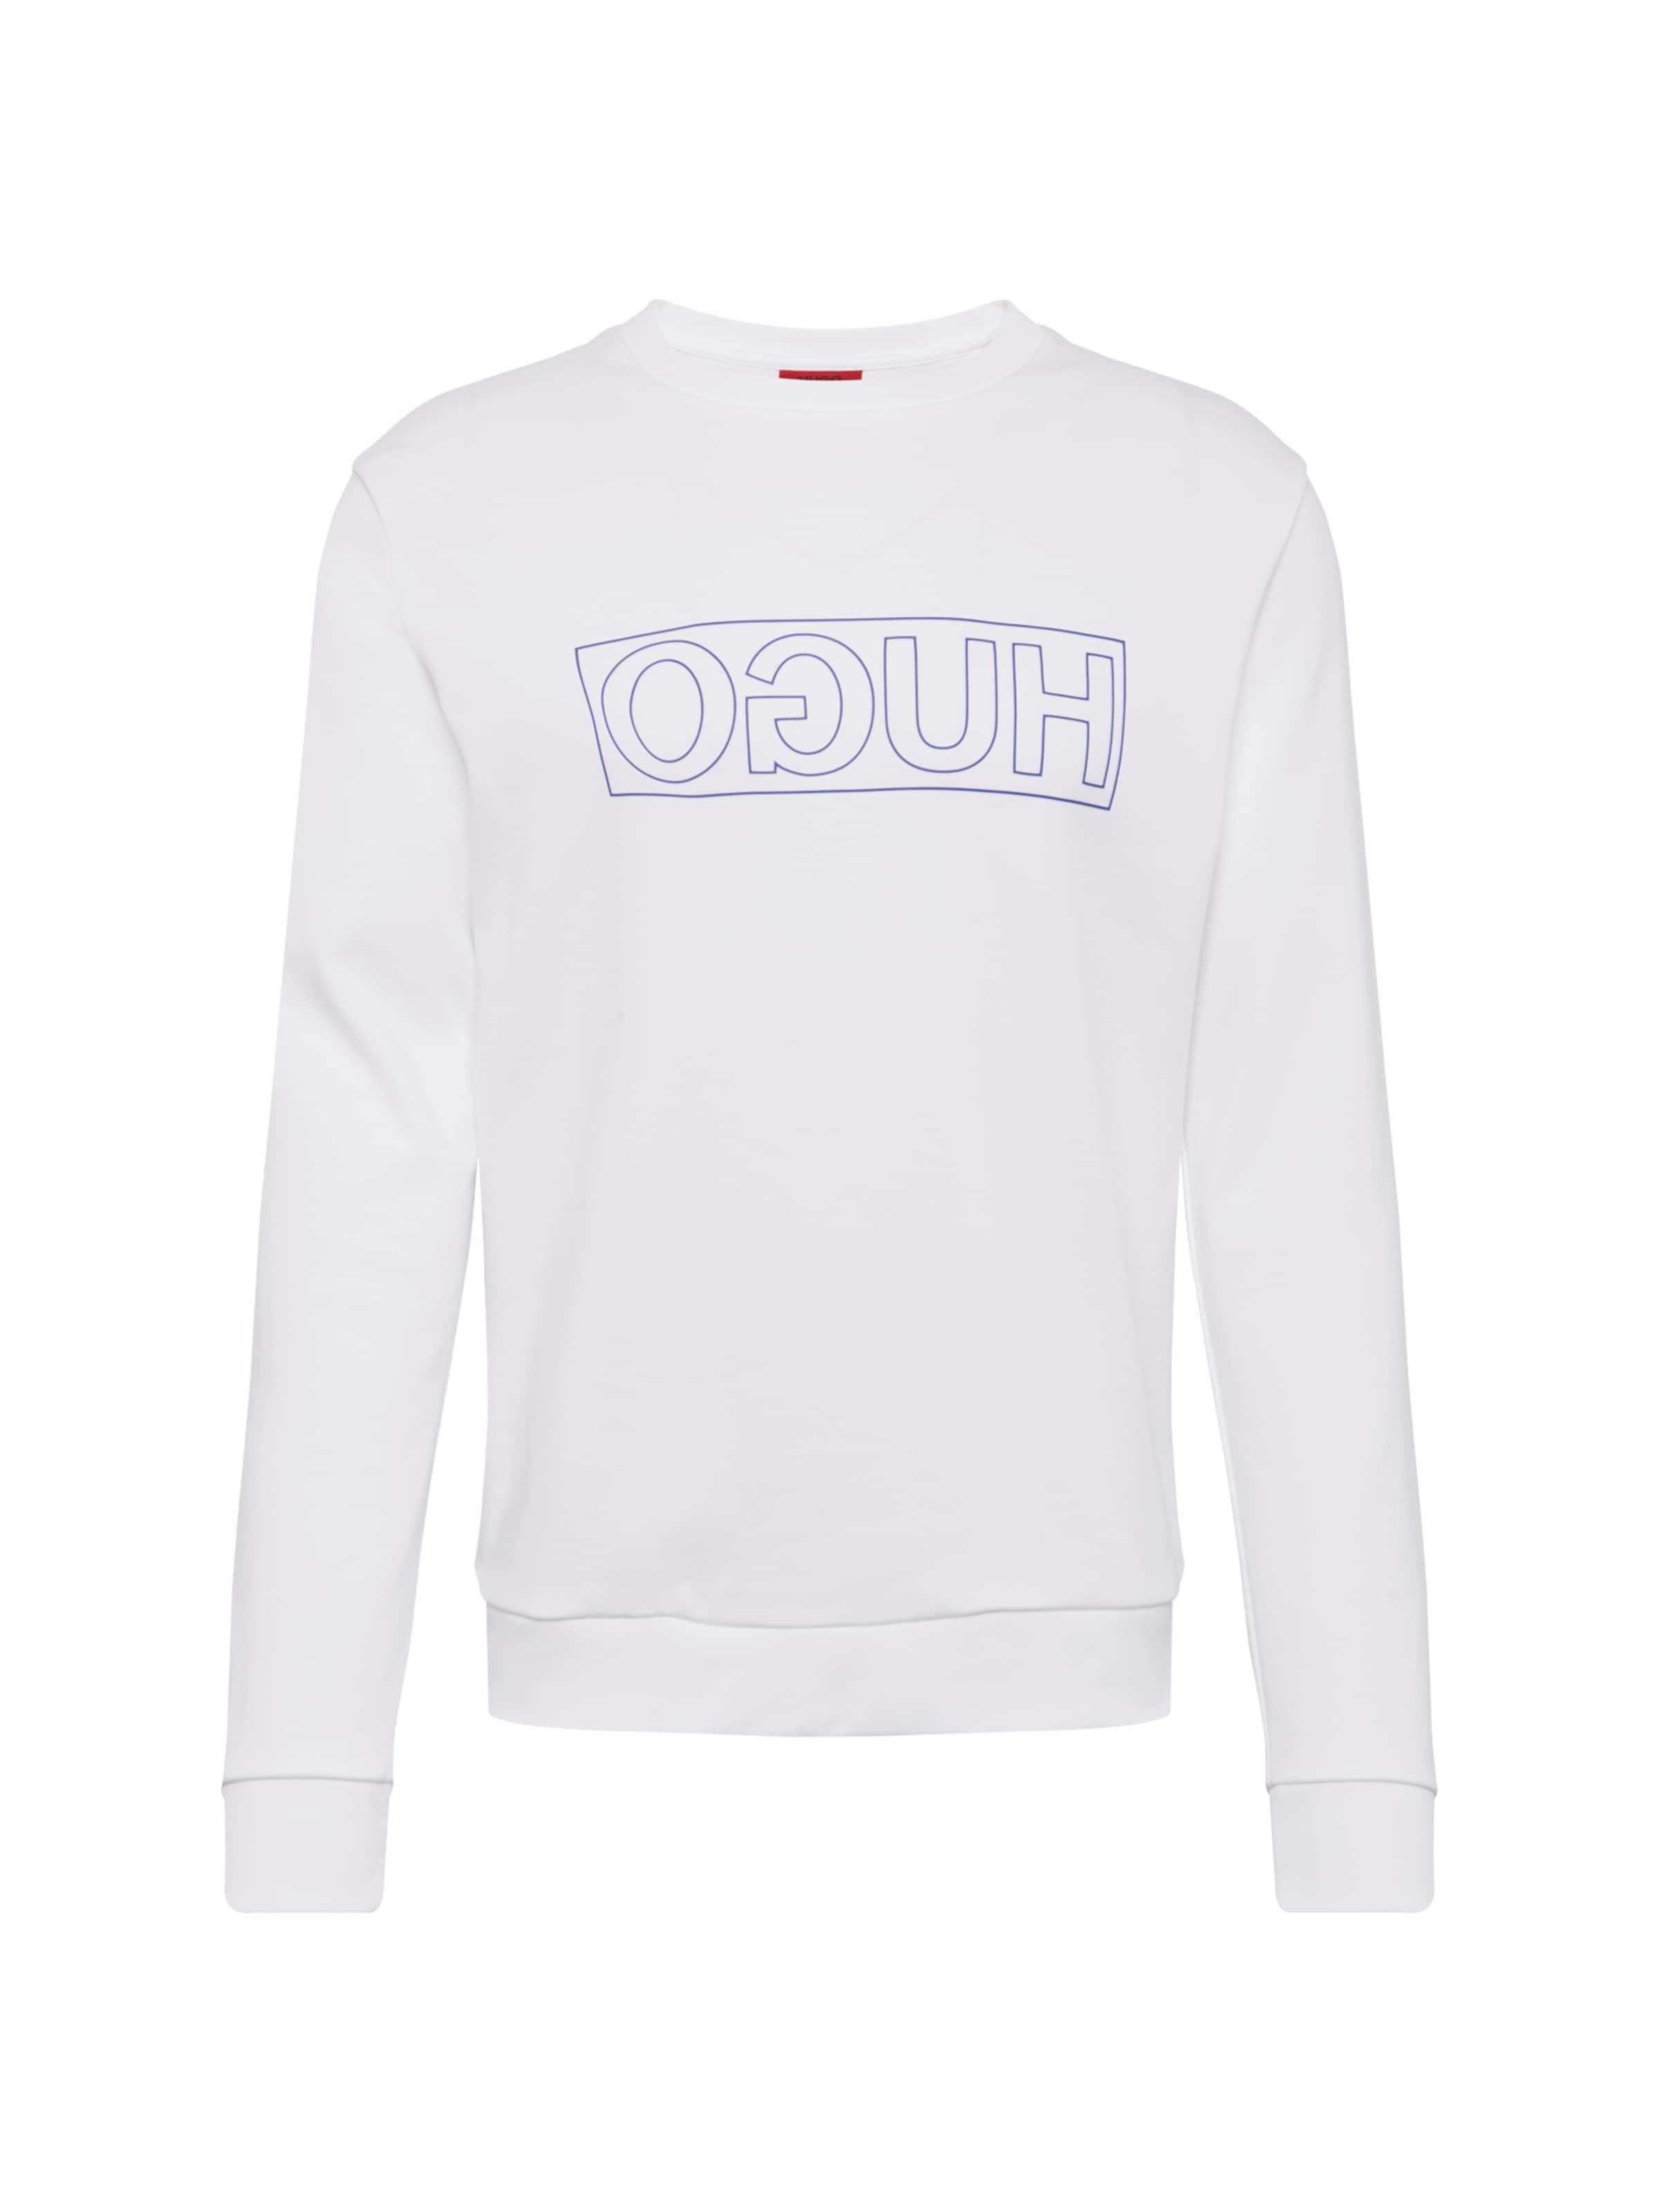 Sweatshirt u6' Weiß 'dicago Hugo In N8nvmw0O